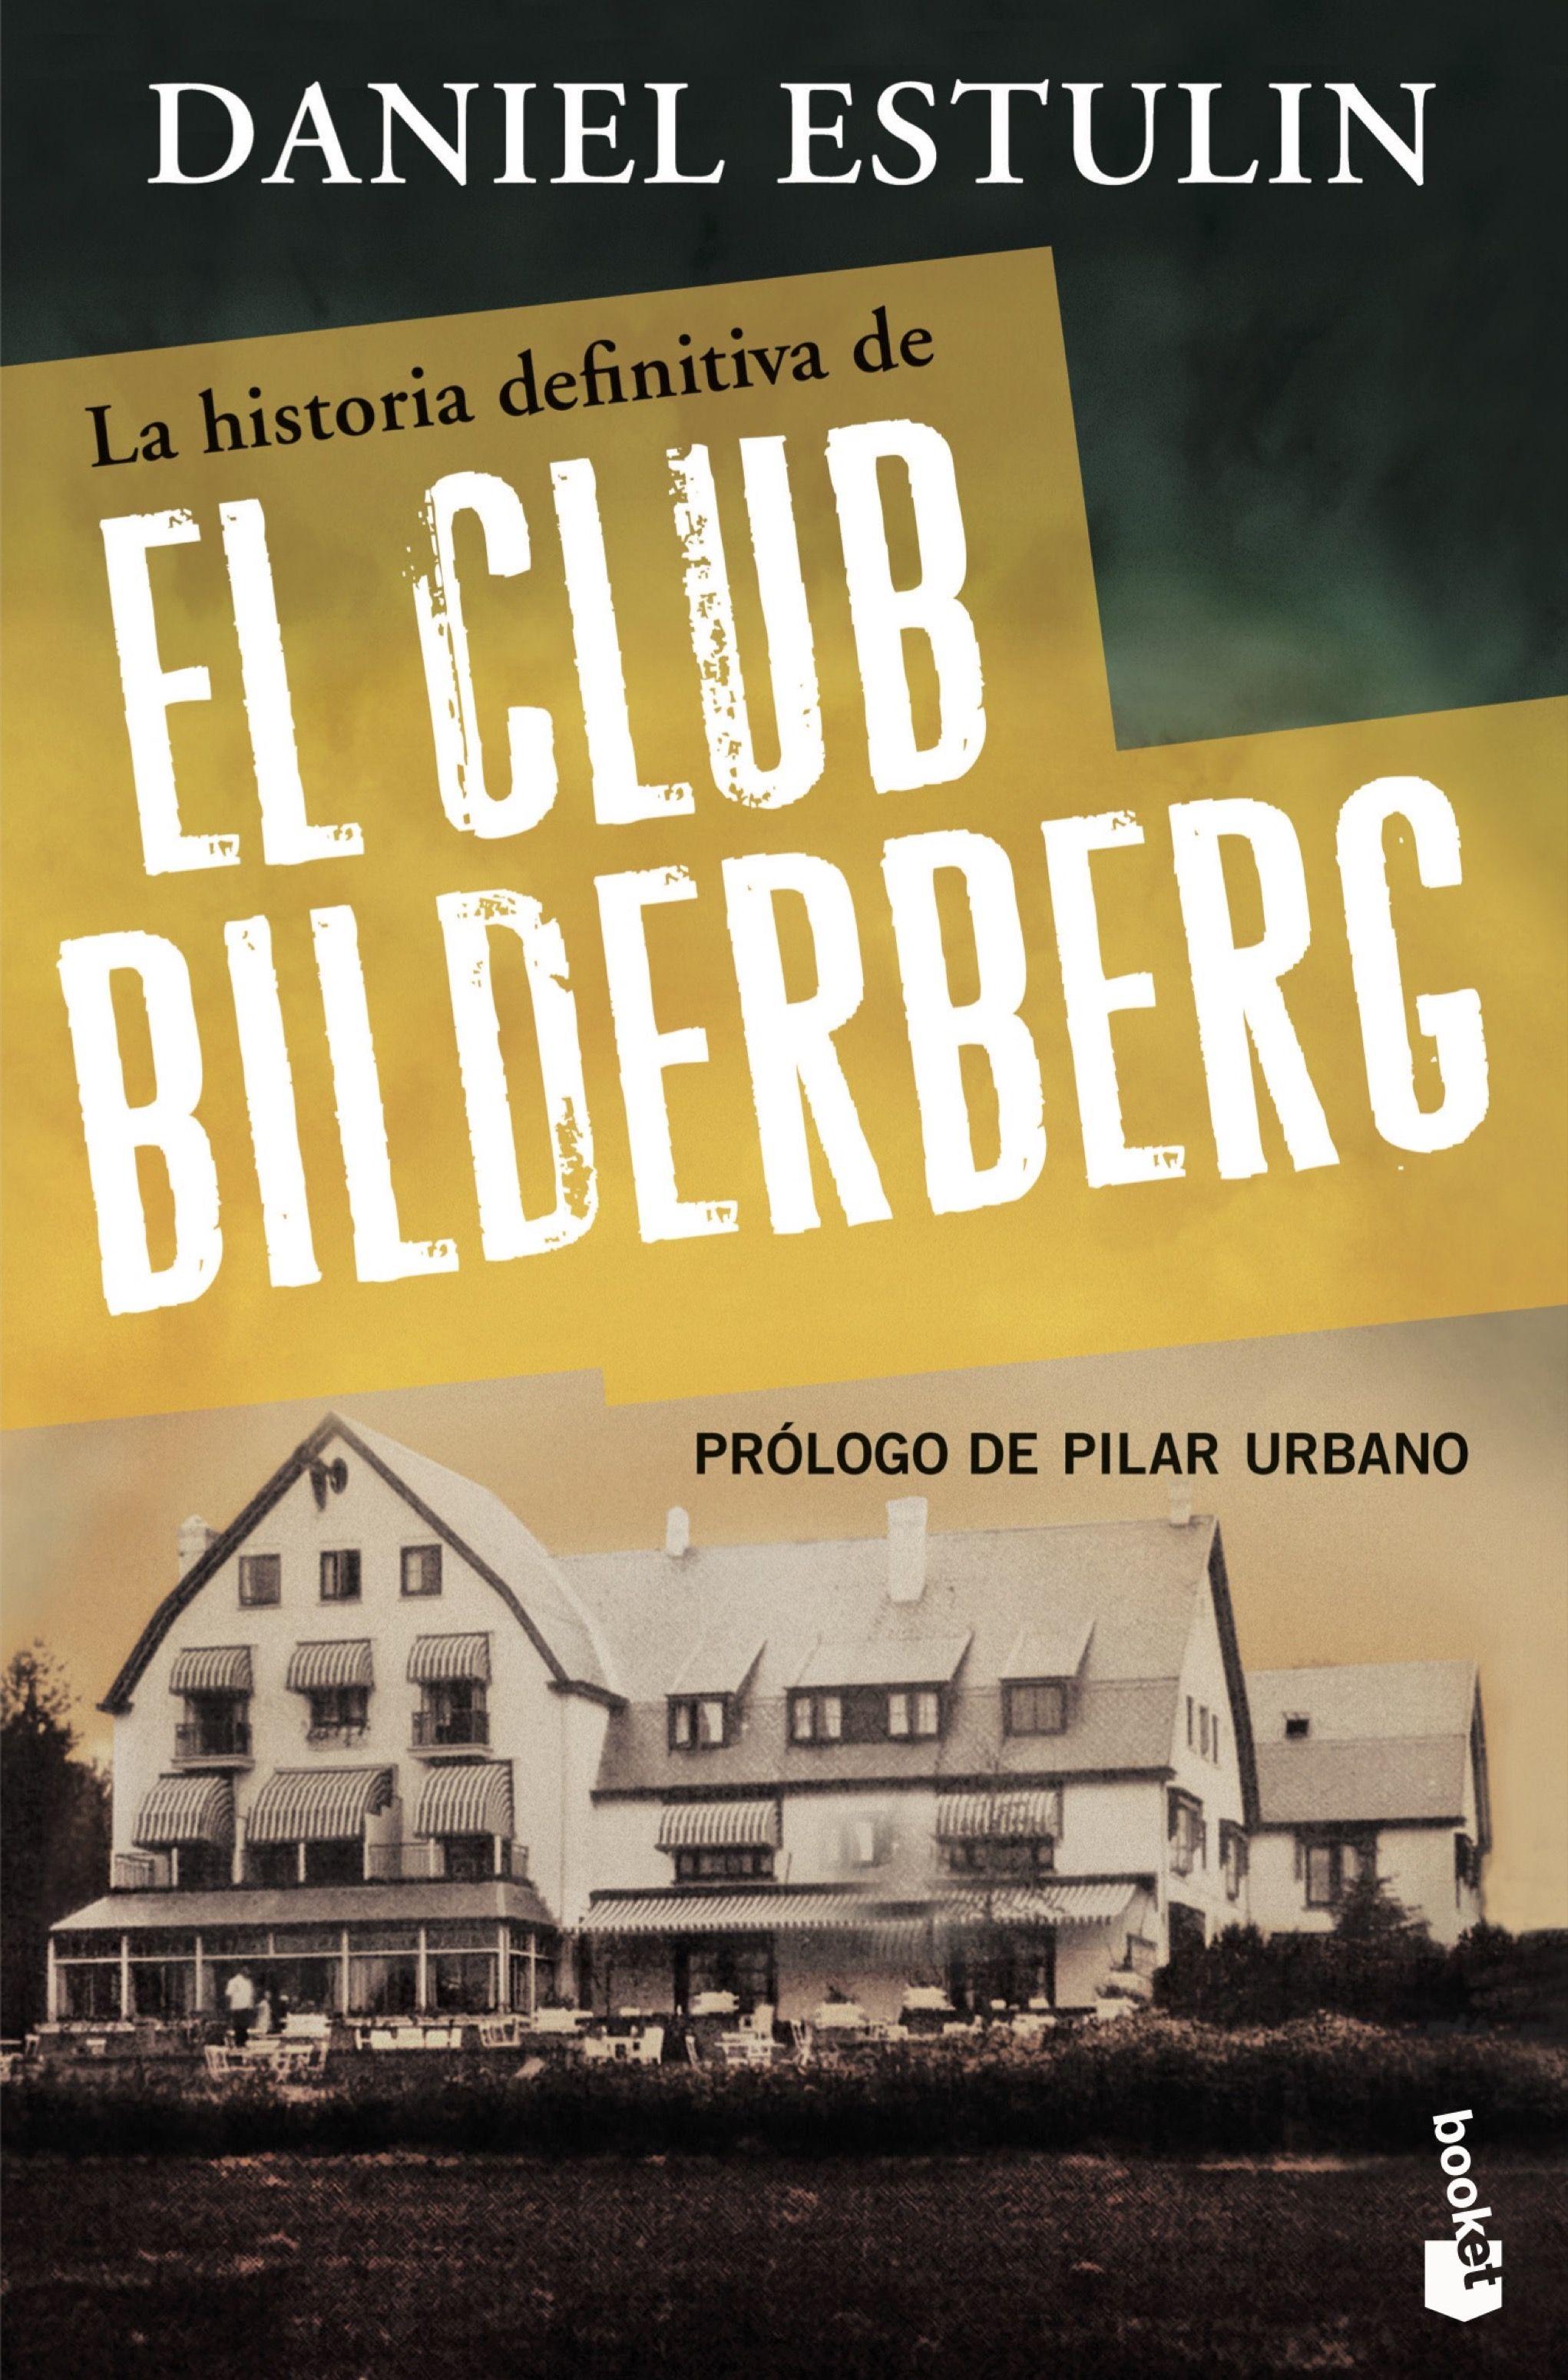 La Historia Definitiva Del Club Bilderberg por Daniel Estulin